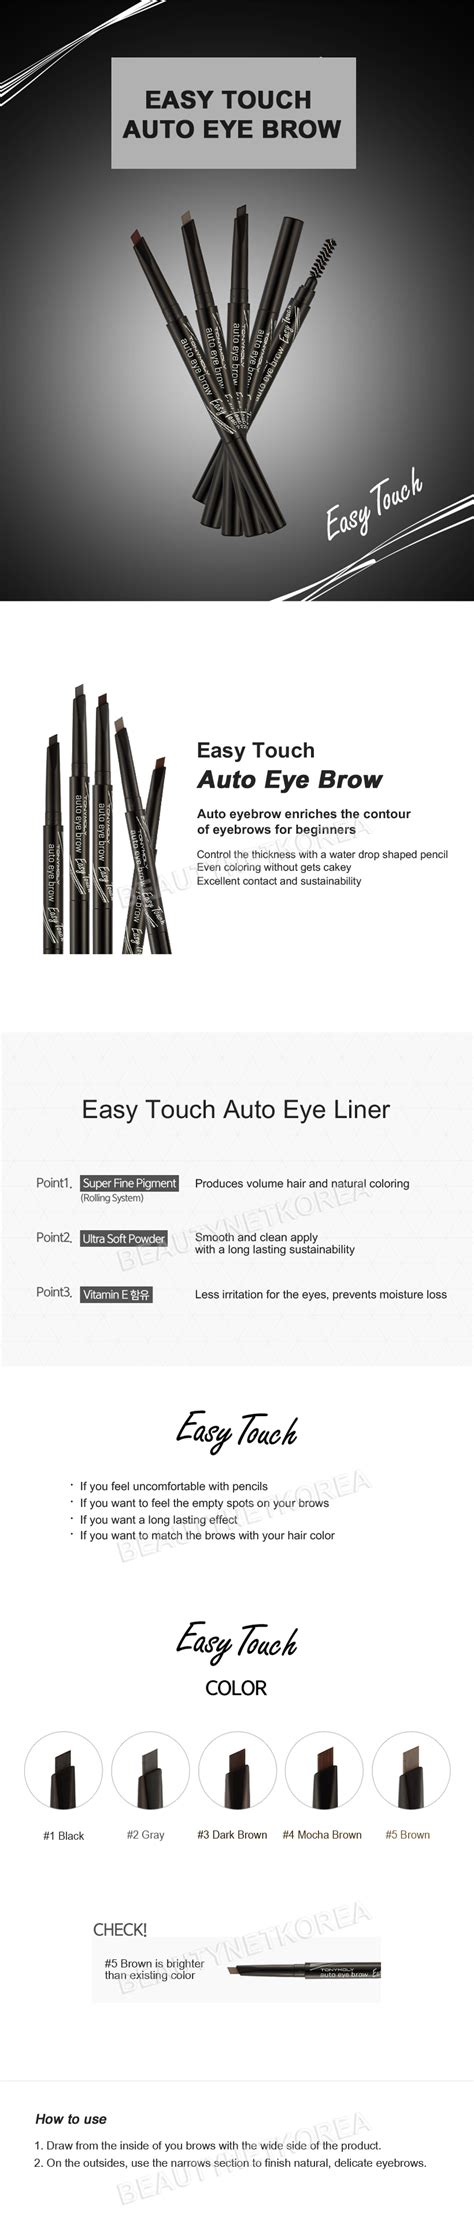 Tonymoly Easy Touch Auto Eyebrow tonymoly easy touch auto eye brow 0 4g 5 color auto